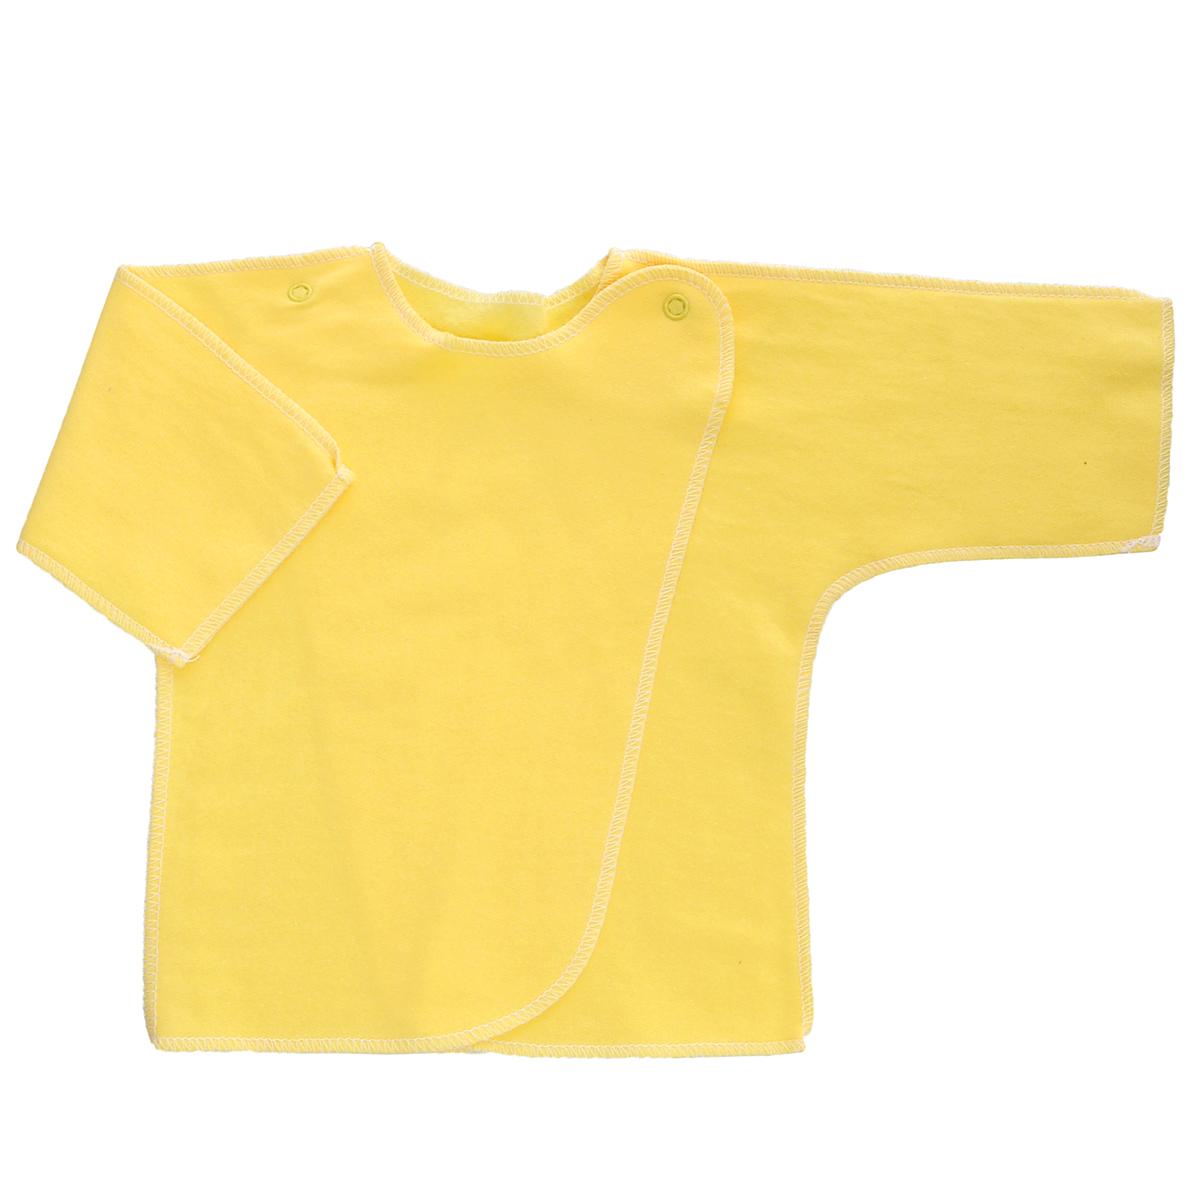 Распашонка Трон-Плюс, цвет: желтый. 5022. Размер 50, 0-1 месяц